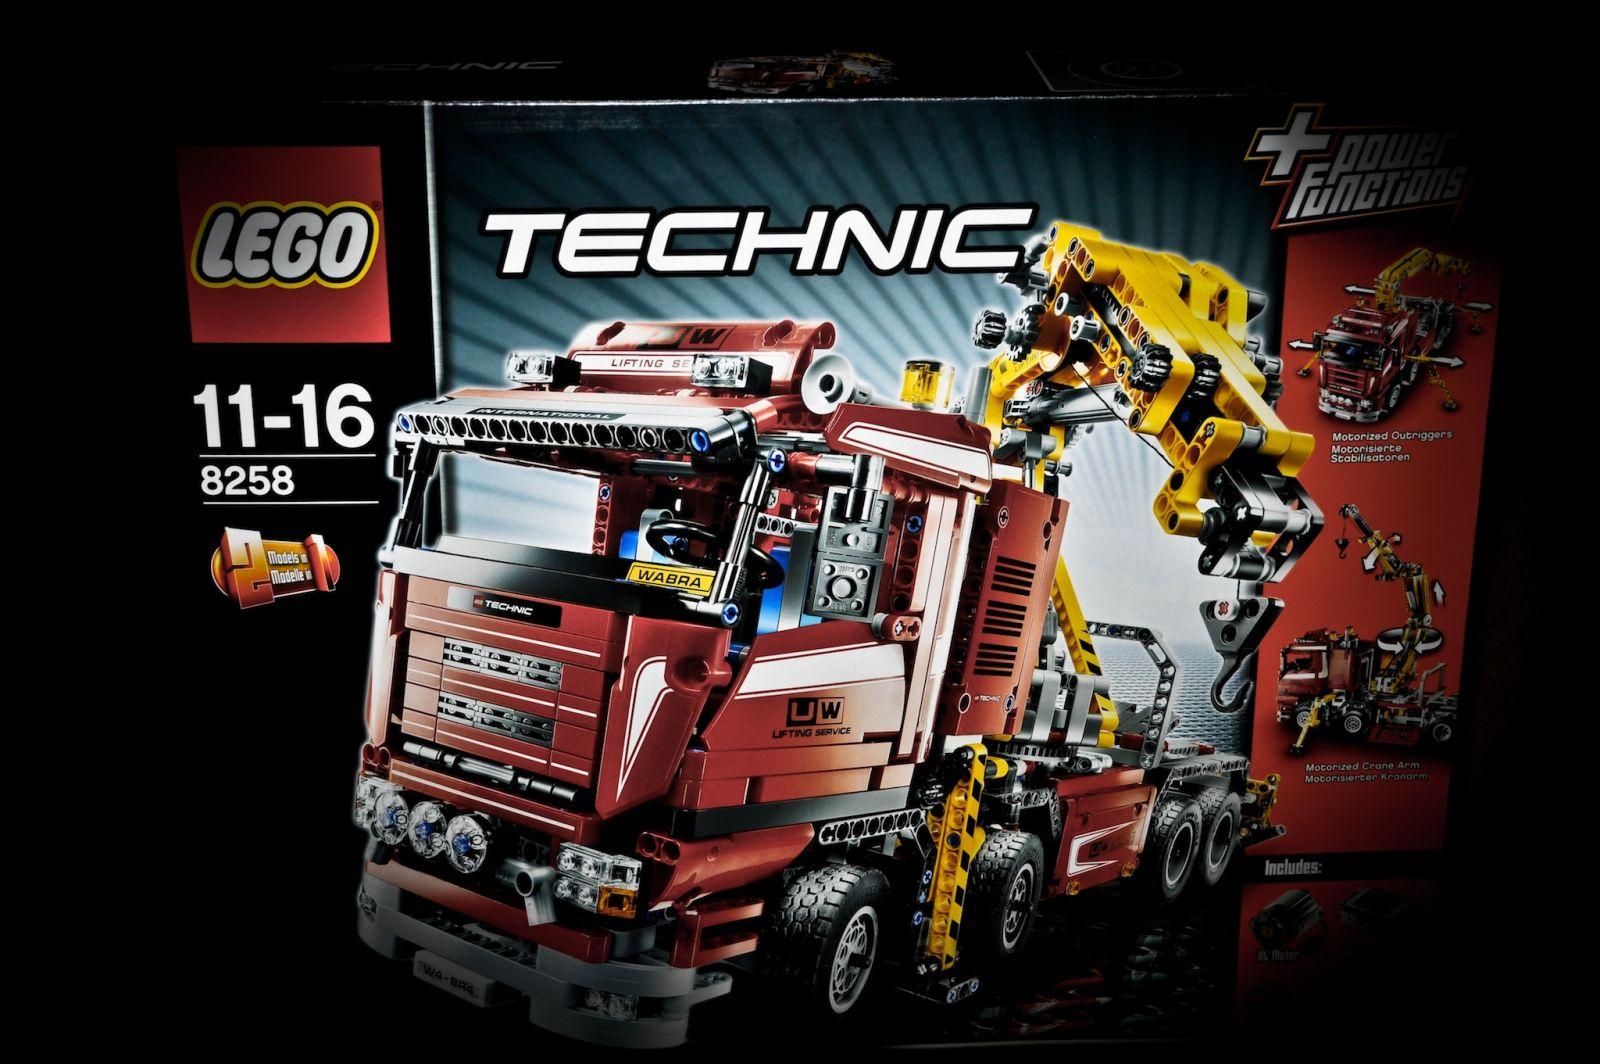 Lego Technik 8258 1